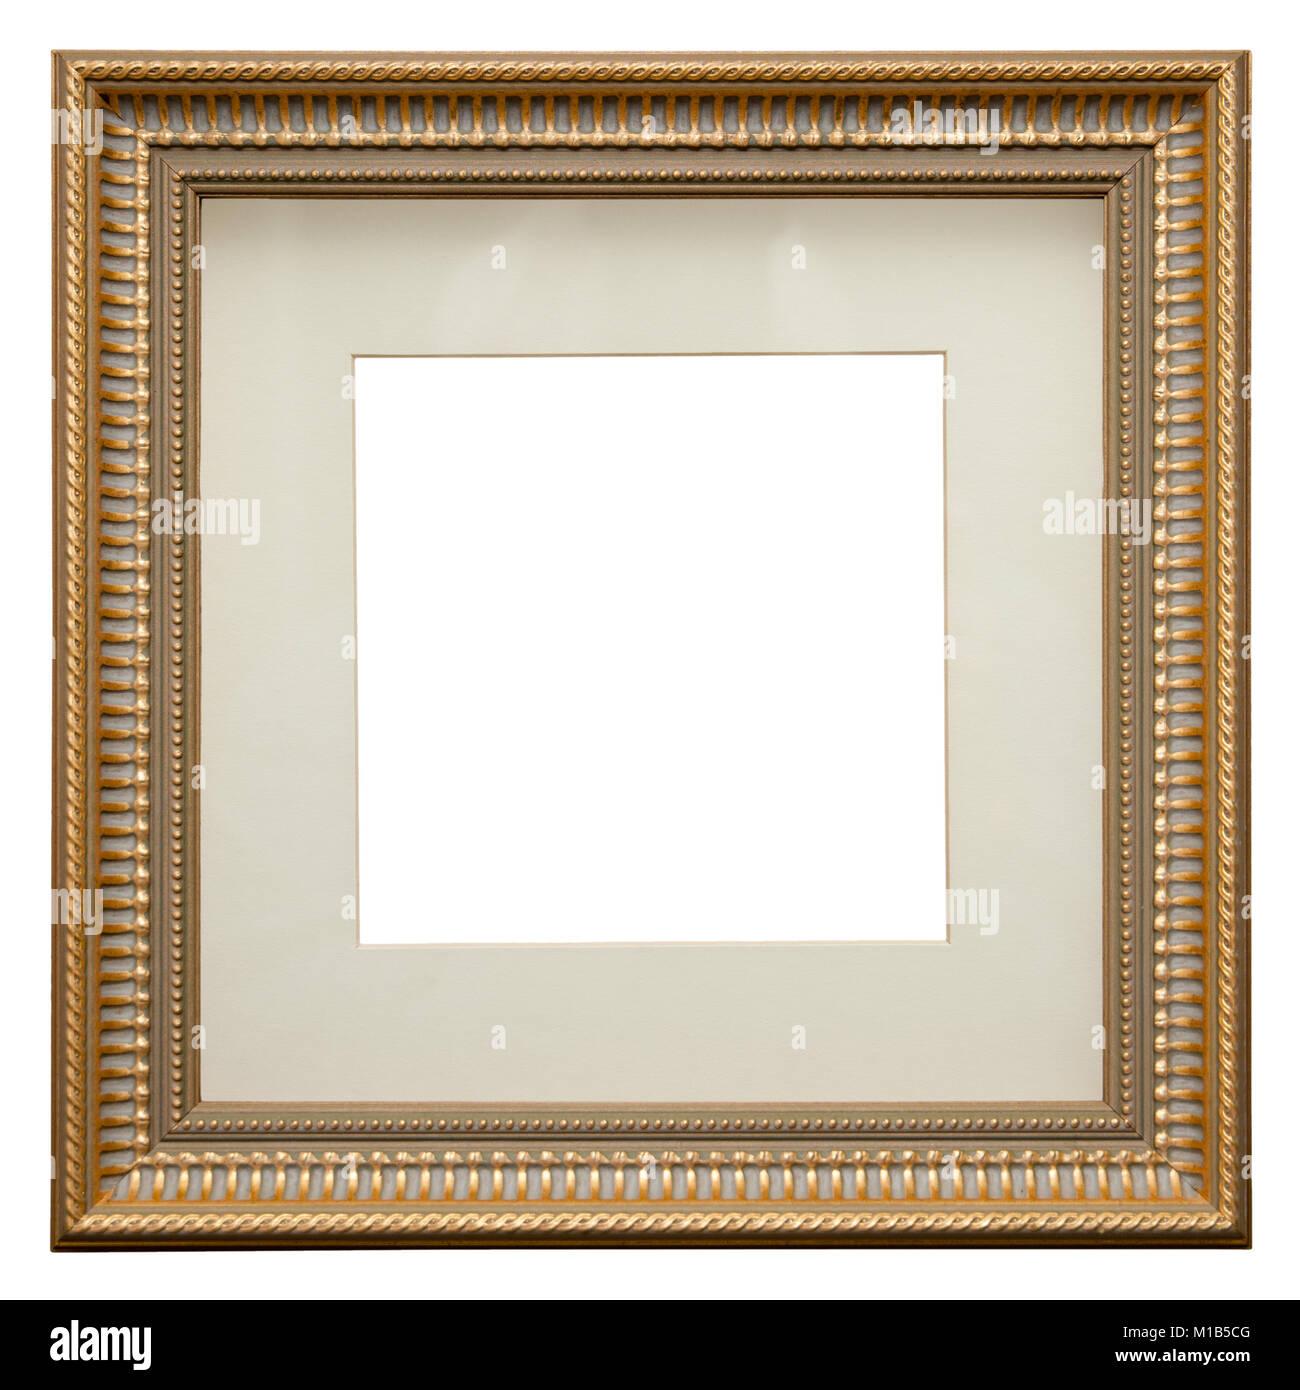 leeren bilderrahmen auf weißen, quadratischen format isoliert, in